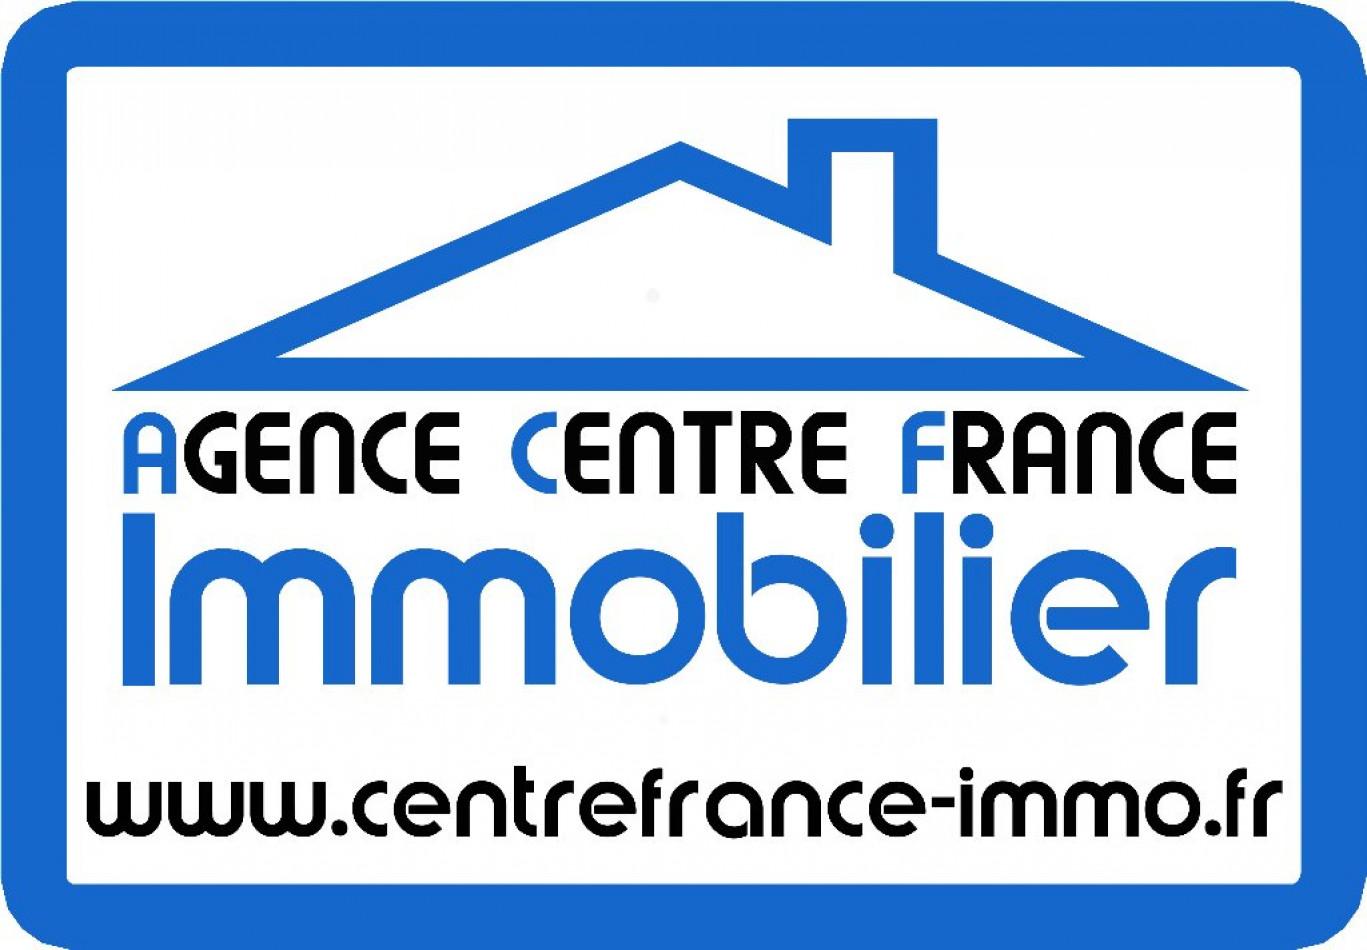 A vendre  Bourges | Réf 030011011 - Agence centre france immobilier